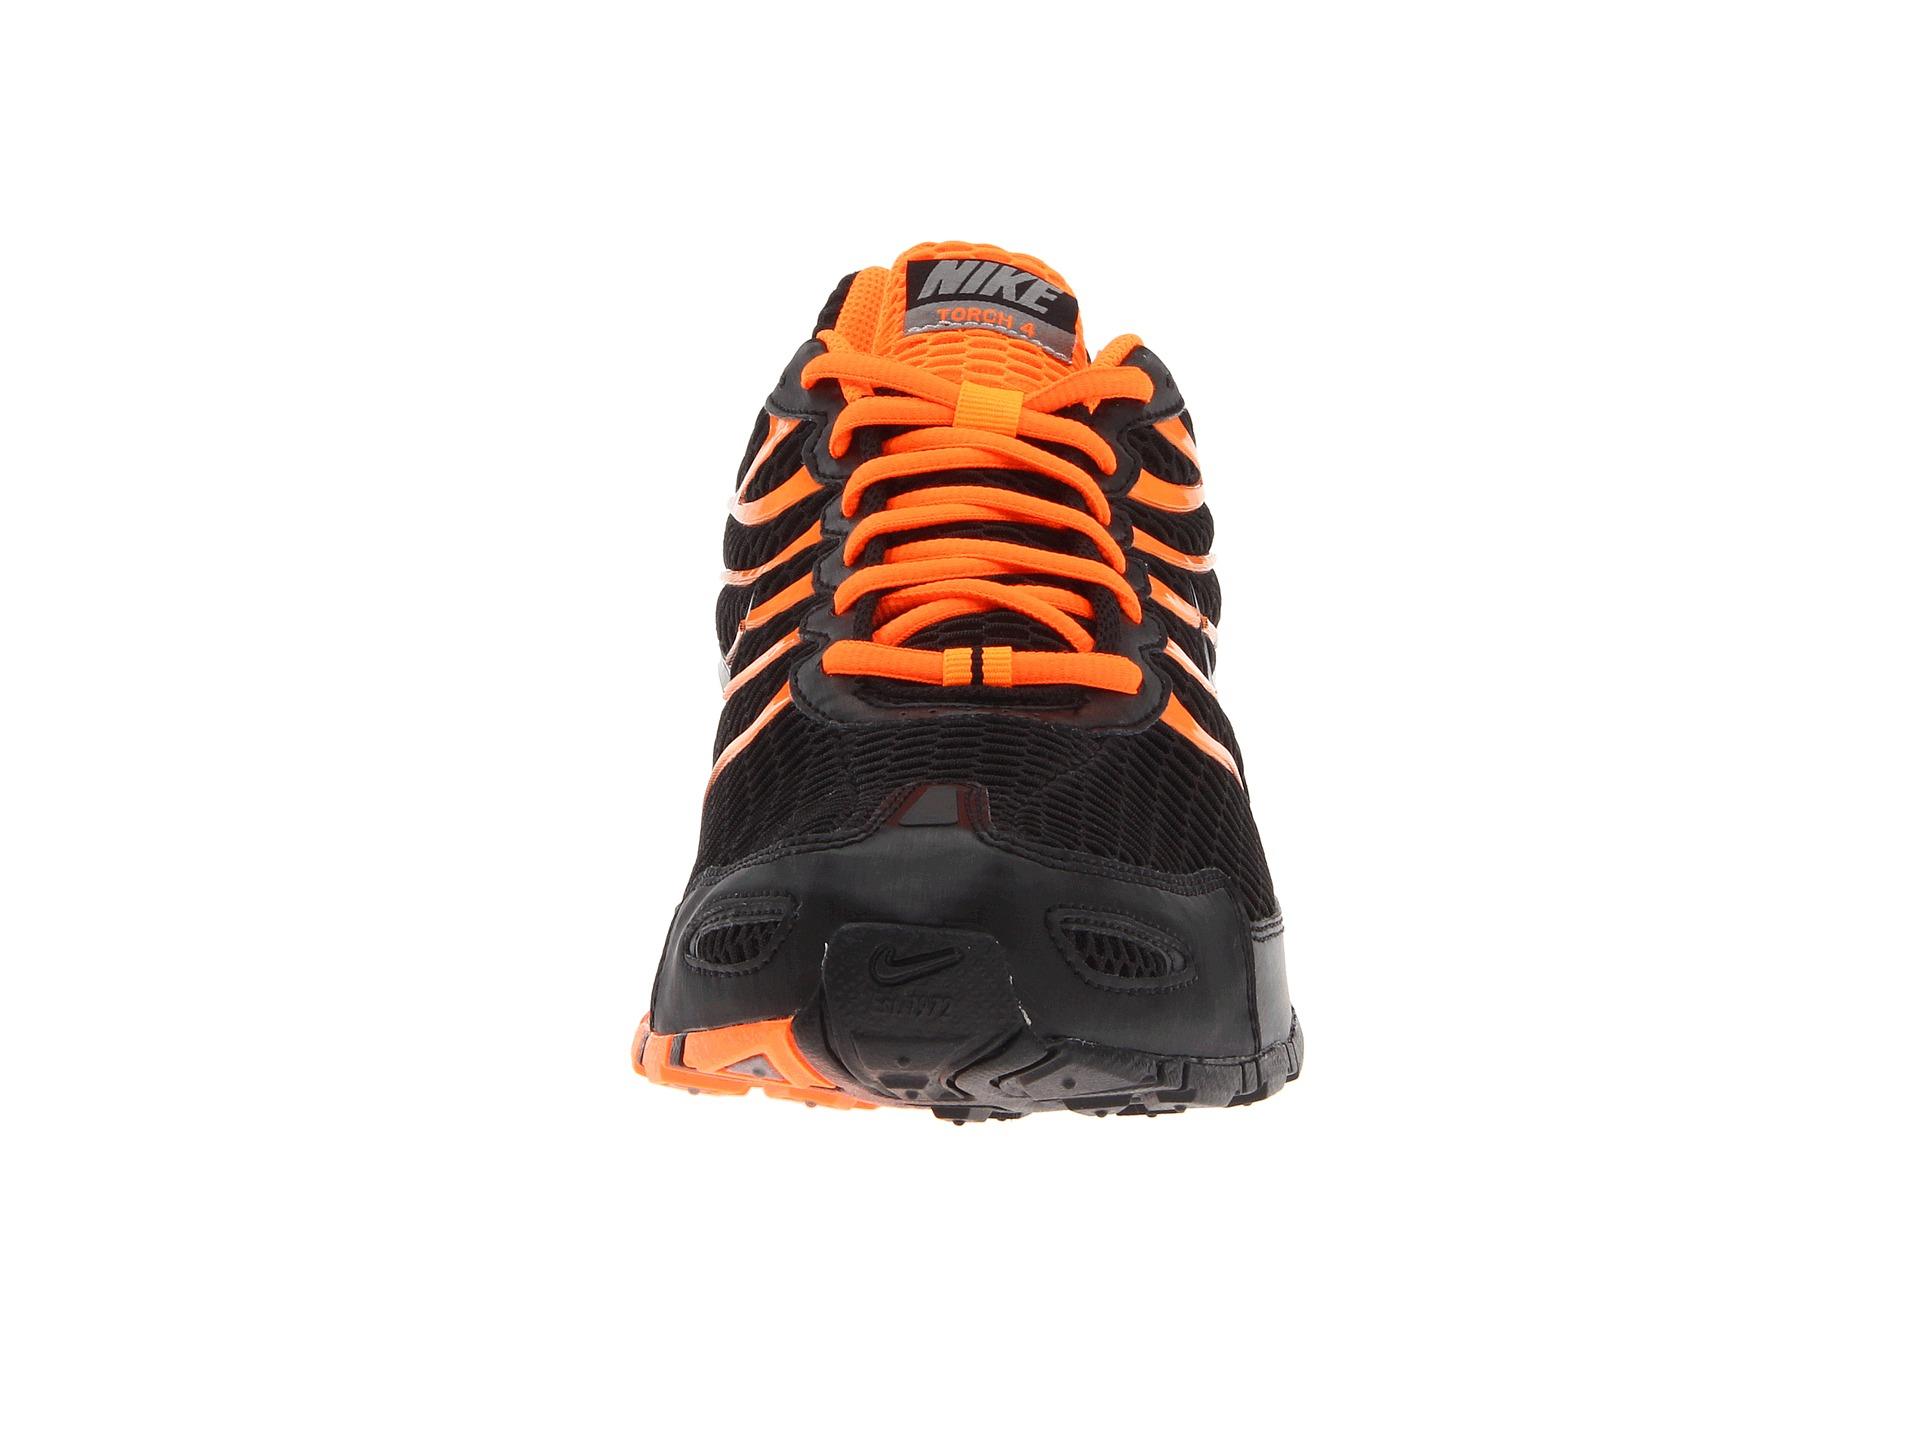 Nike air max torch 4 running shoe - Gallery Previously Sold At Zappos Men S Nike Air Max